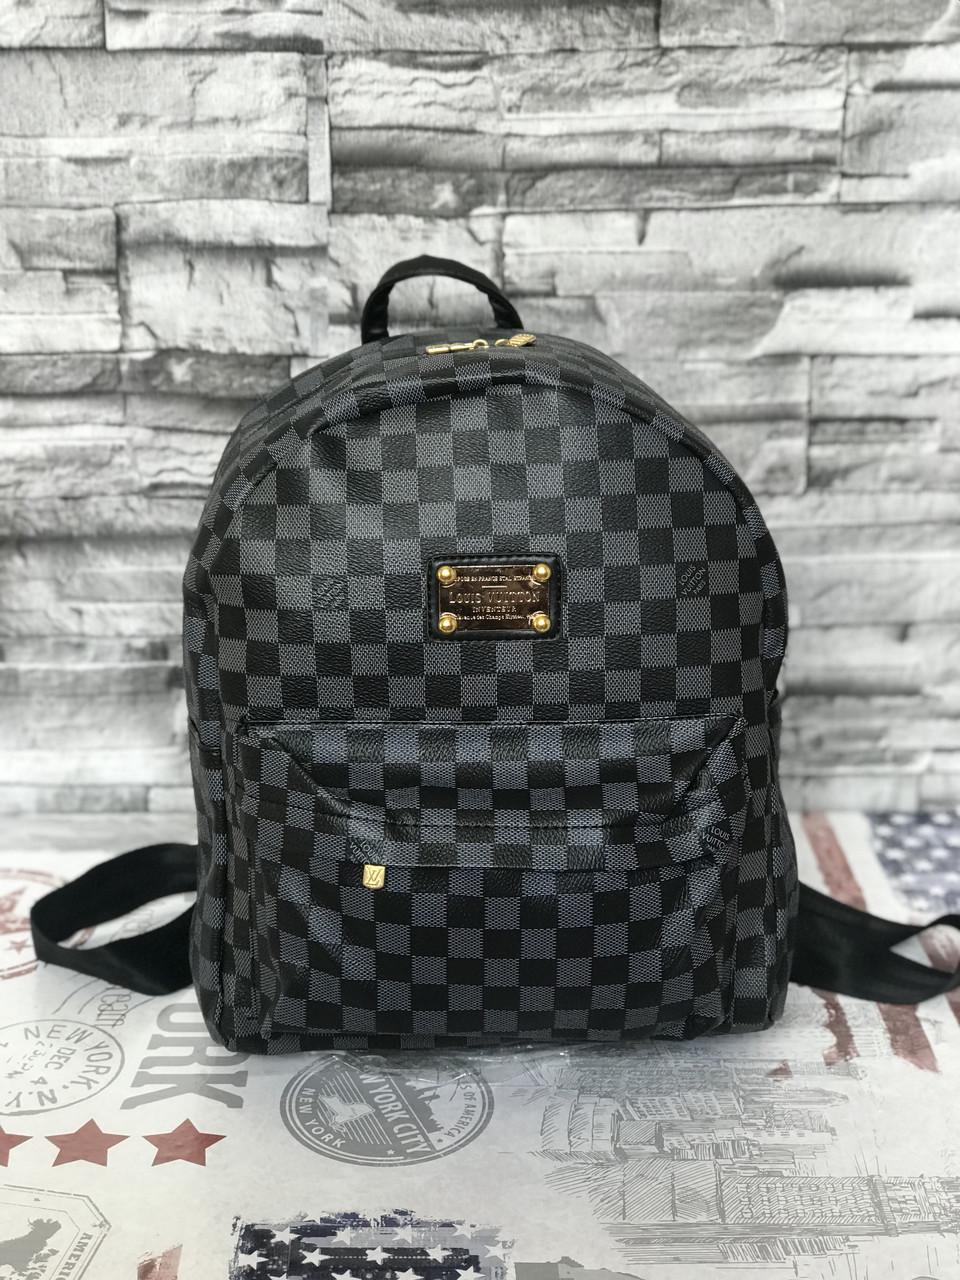 Рюкзак ранец портфель LV Louis Vuitton  (реплика Луи Витон) black